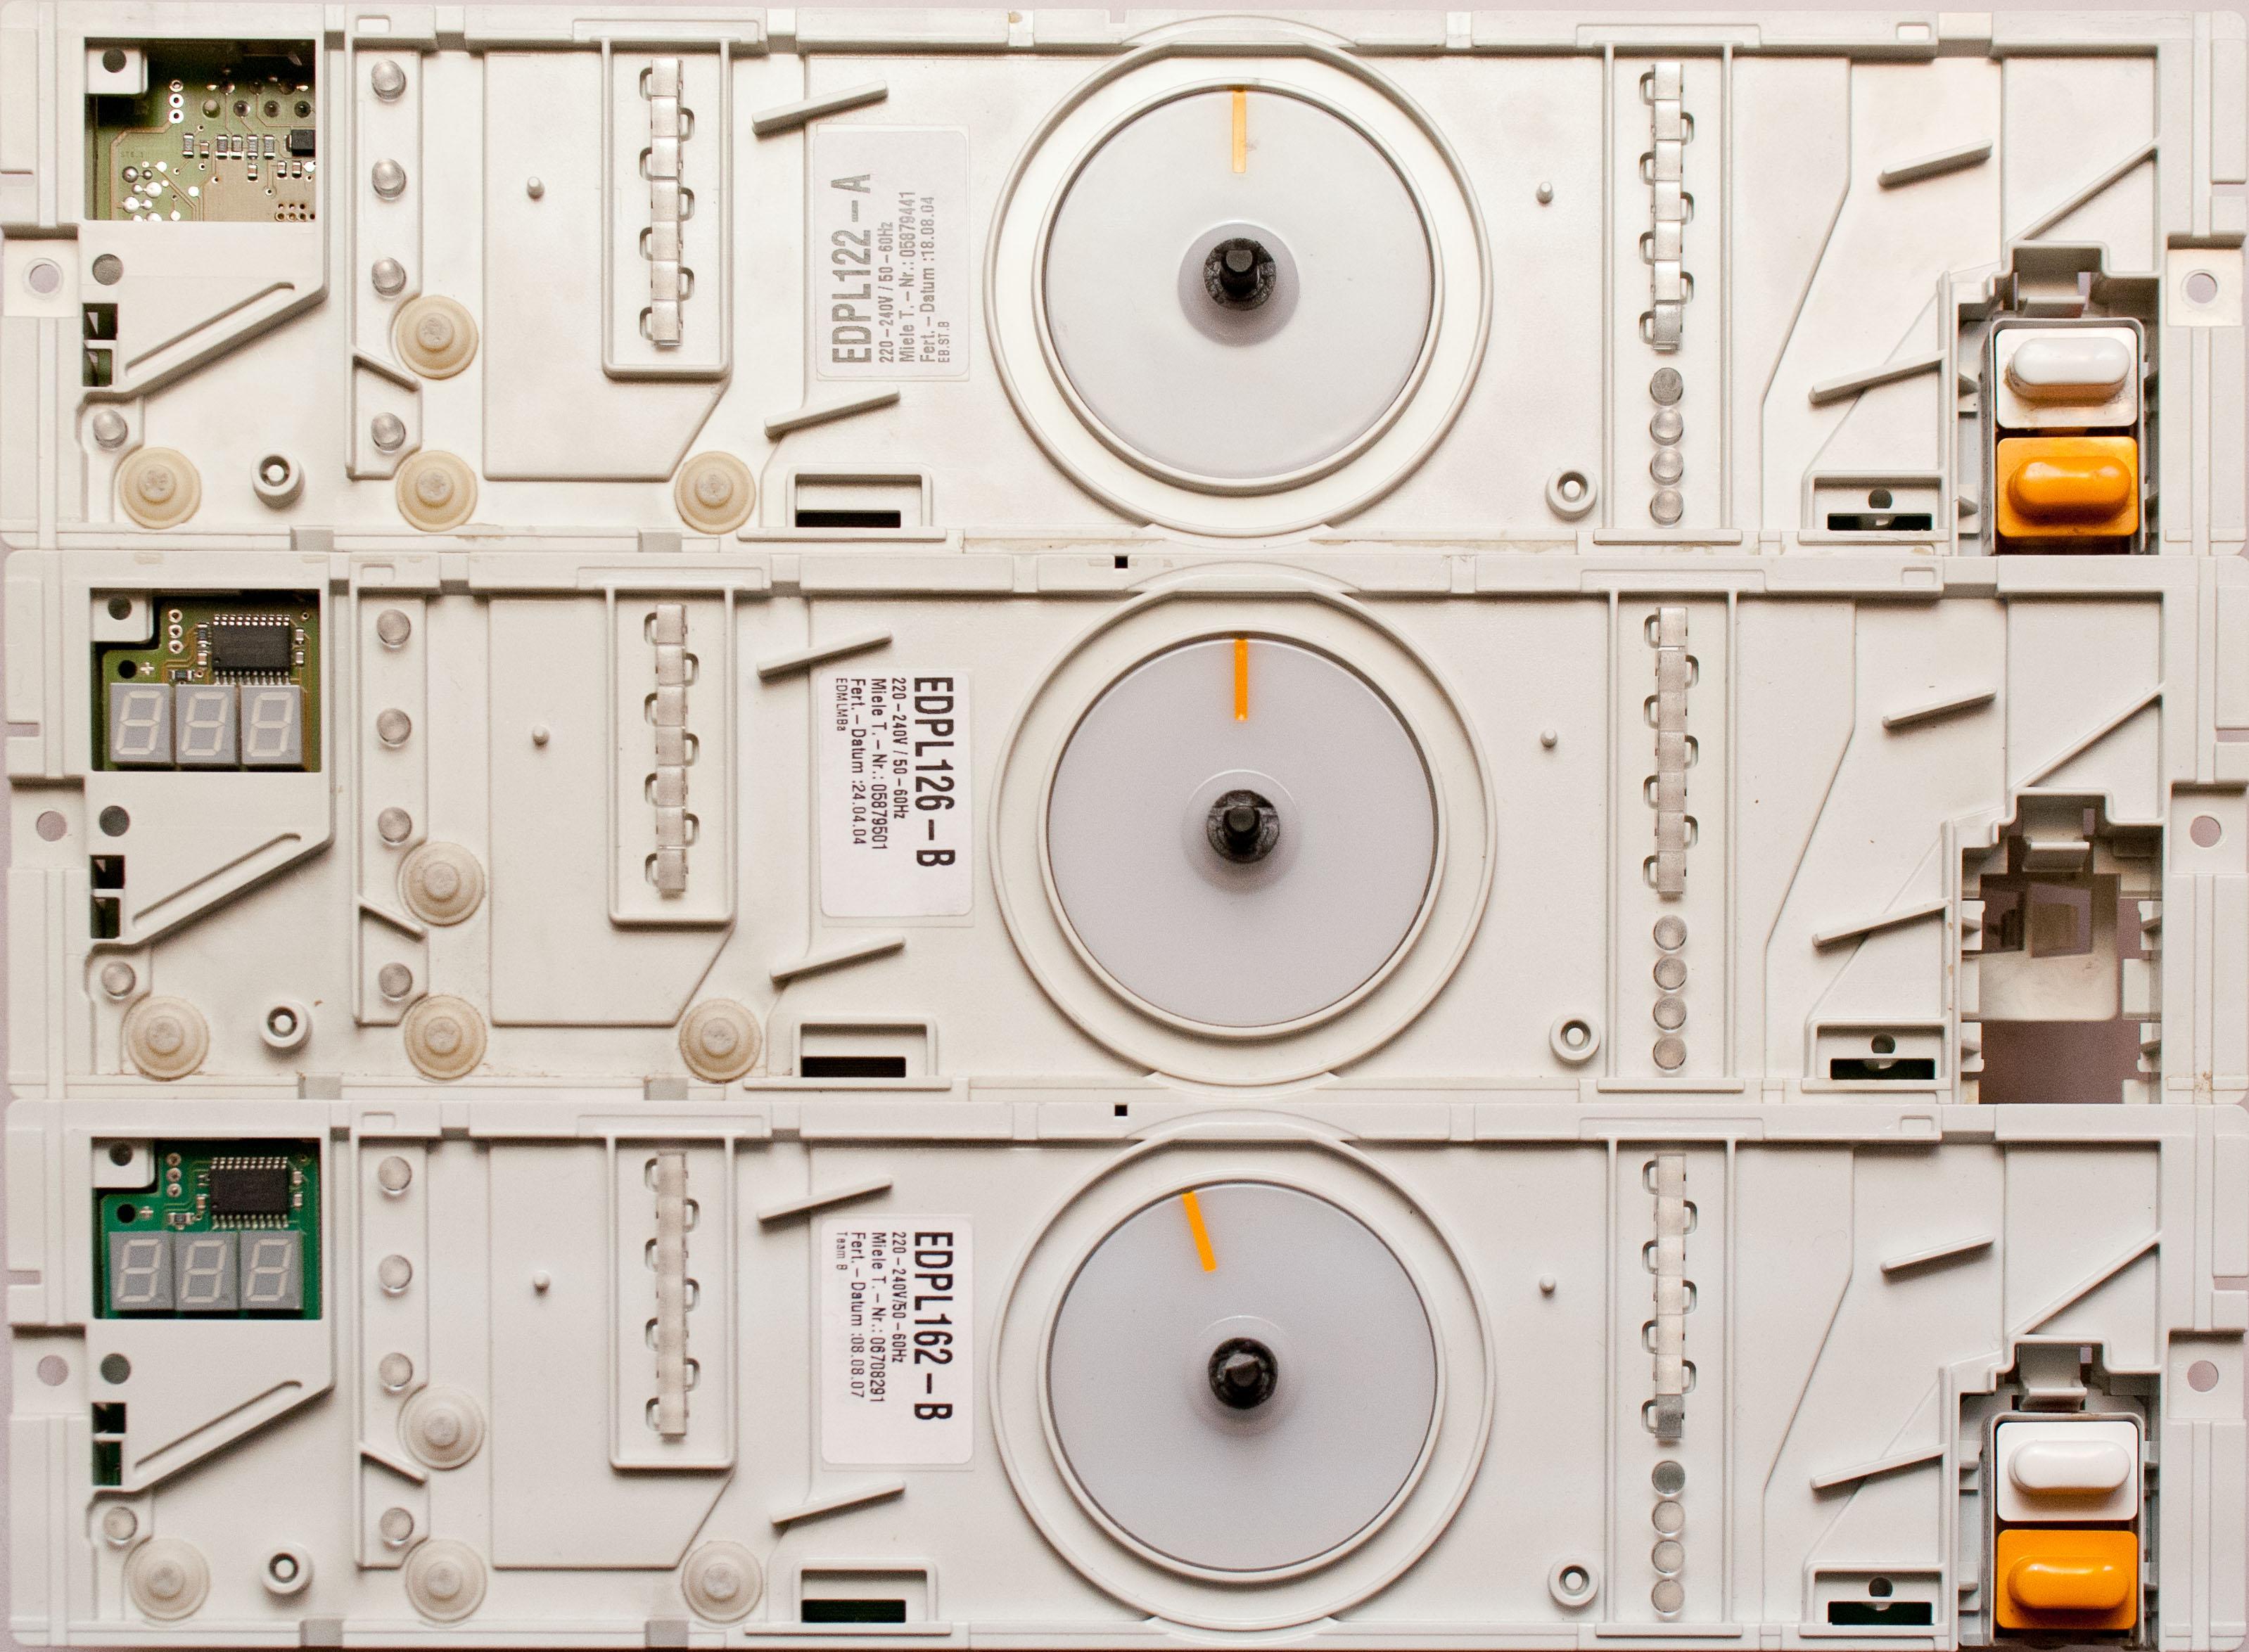 Miele W800 Service Manual Sinlost Washing Machine Wiring Diagram